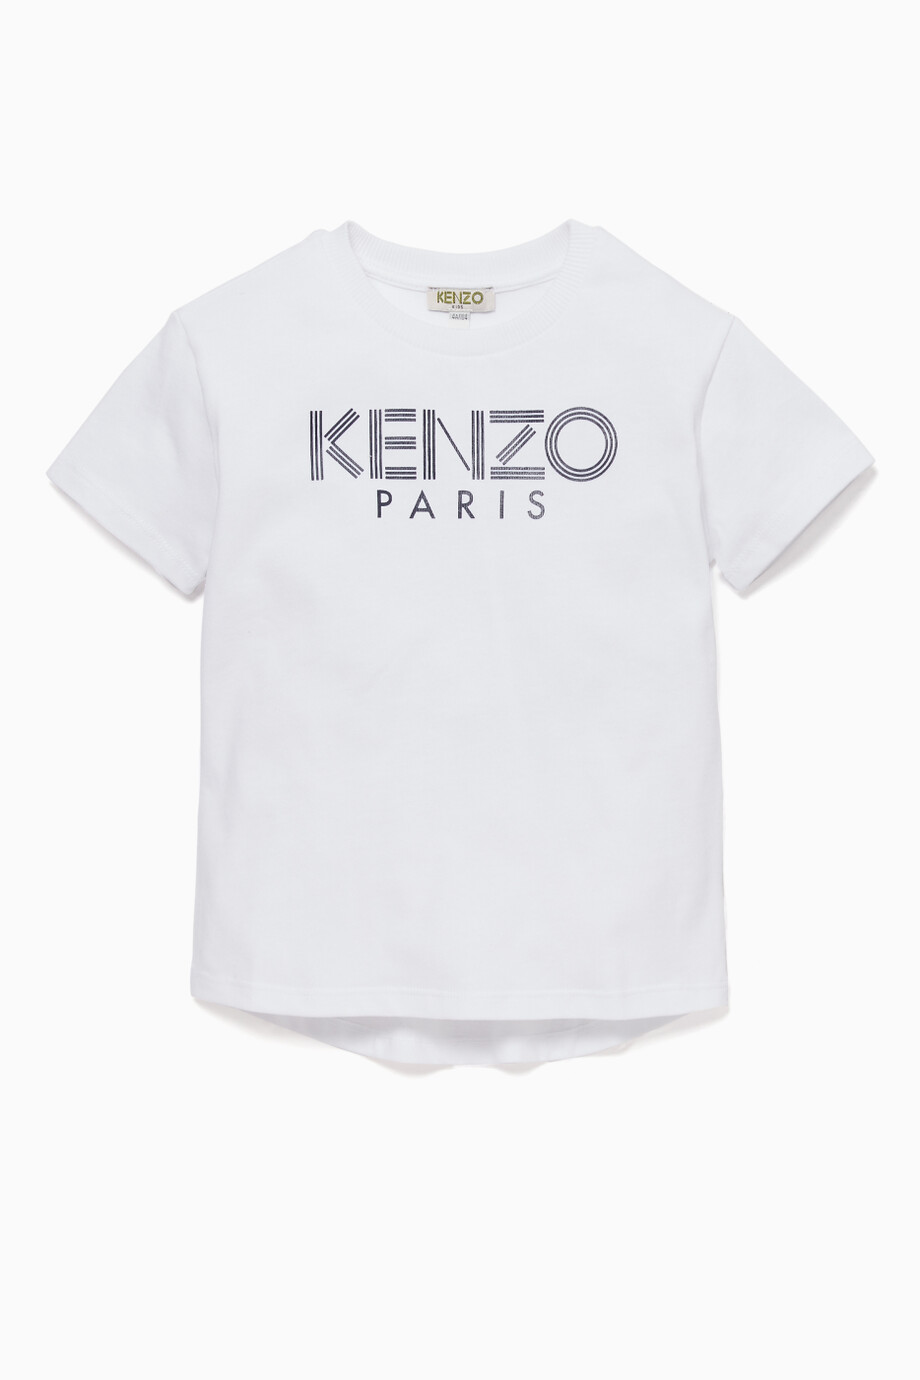 4f7ae053 Shop Kenzo White Graphic Logo Print T-Shirt for Kids   Ounass